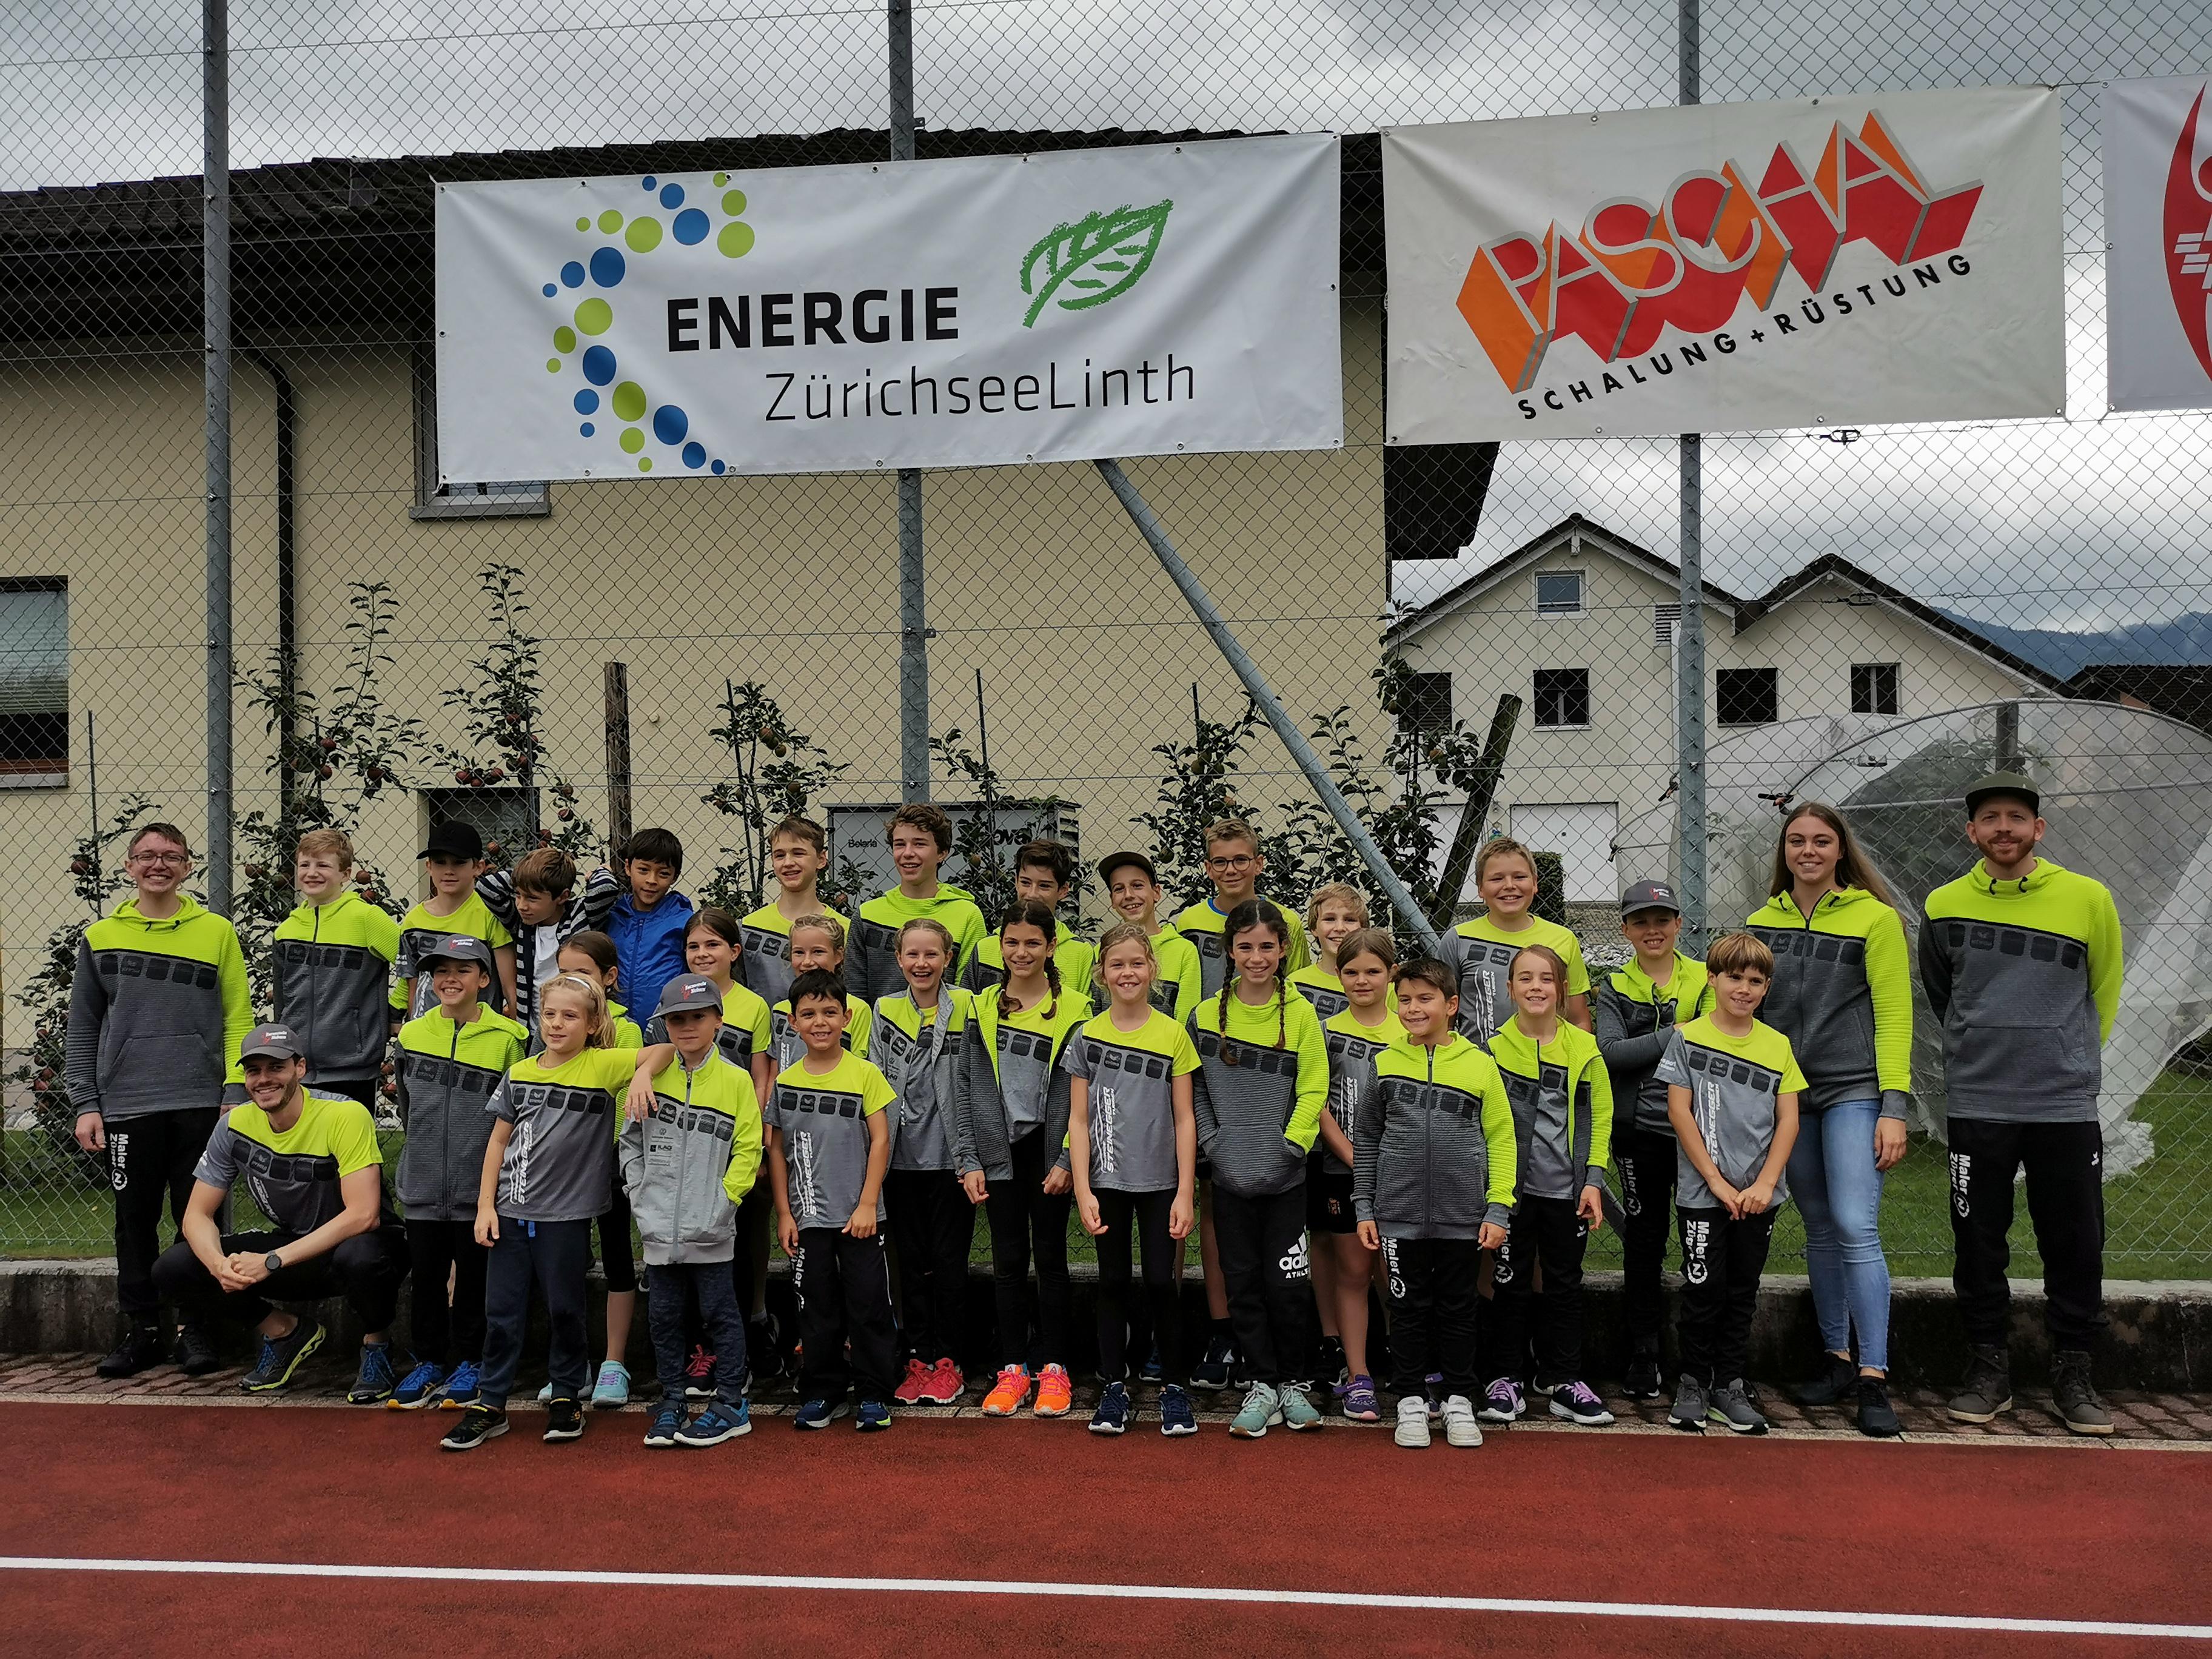 Jugendturntag Wangen/SZ 2021